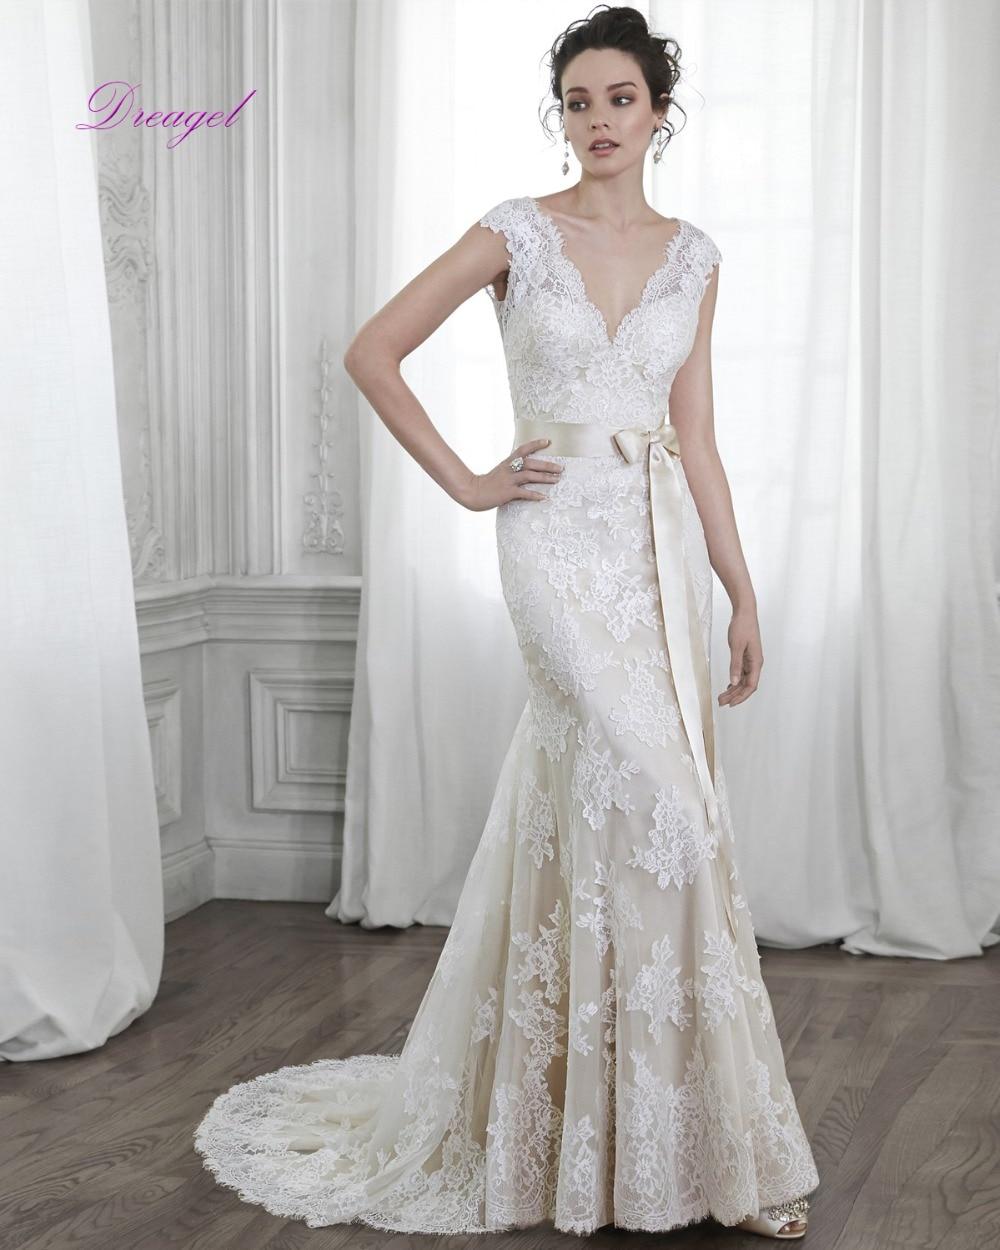 dreagel new design style elegant princess wedding dress sexy v neck backless pretty nifty sashes